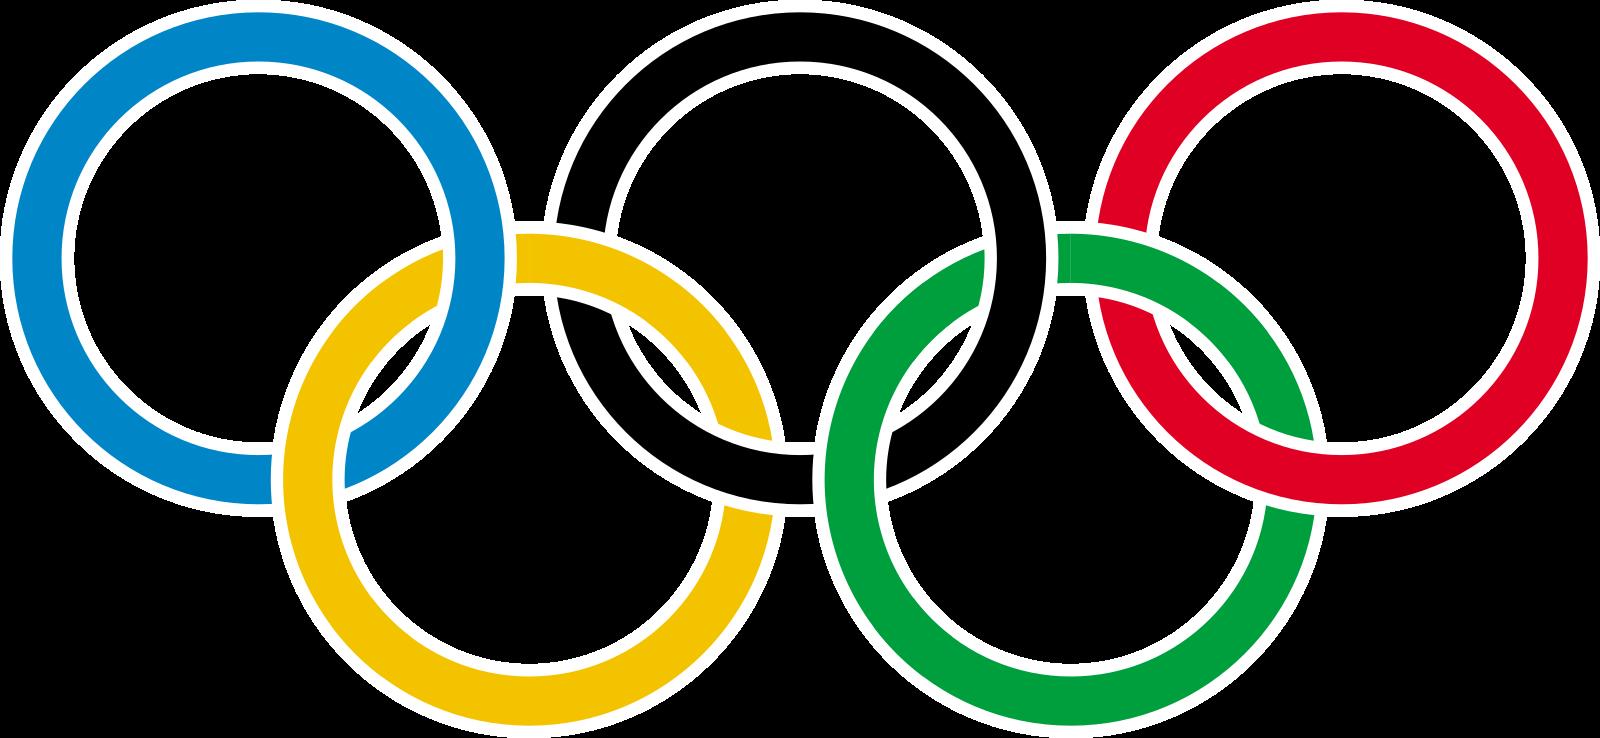 coi-logo-comite-olimpico-internacional-logo-2